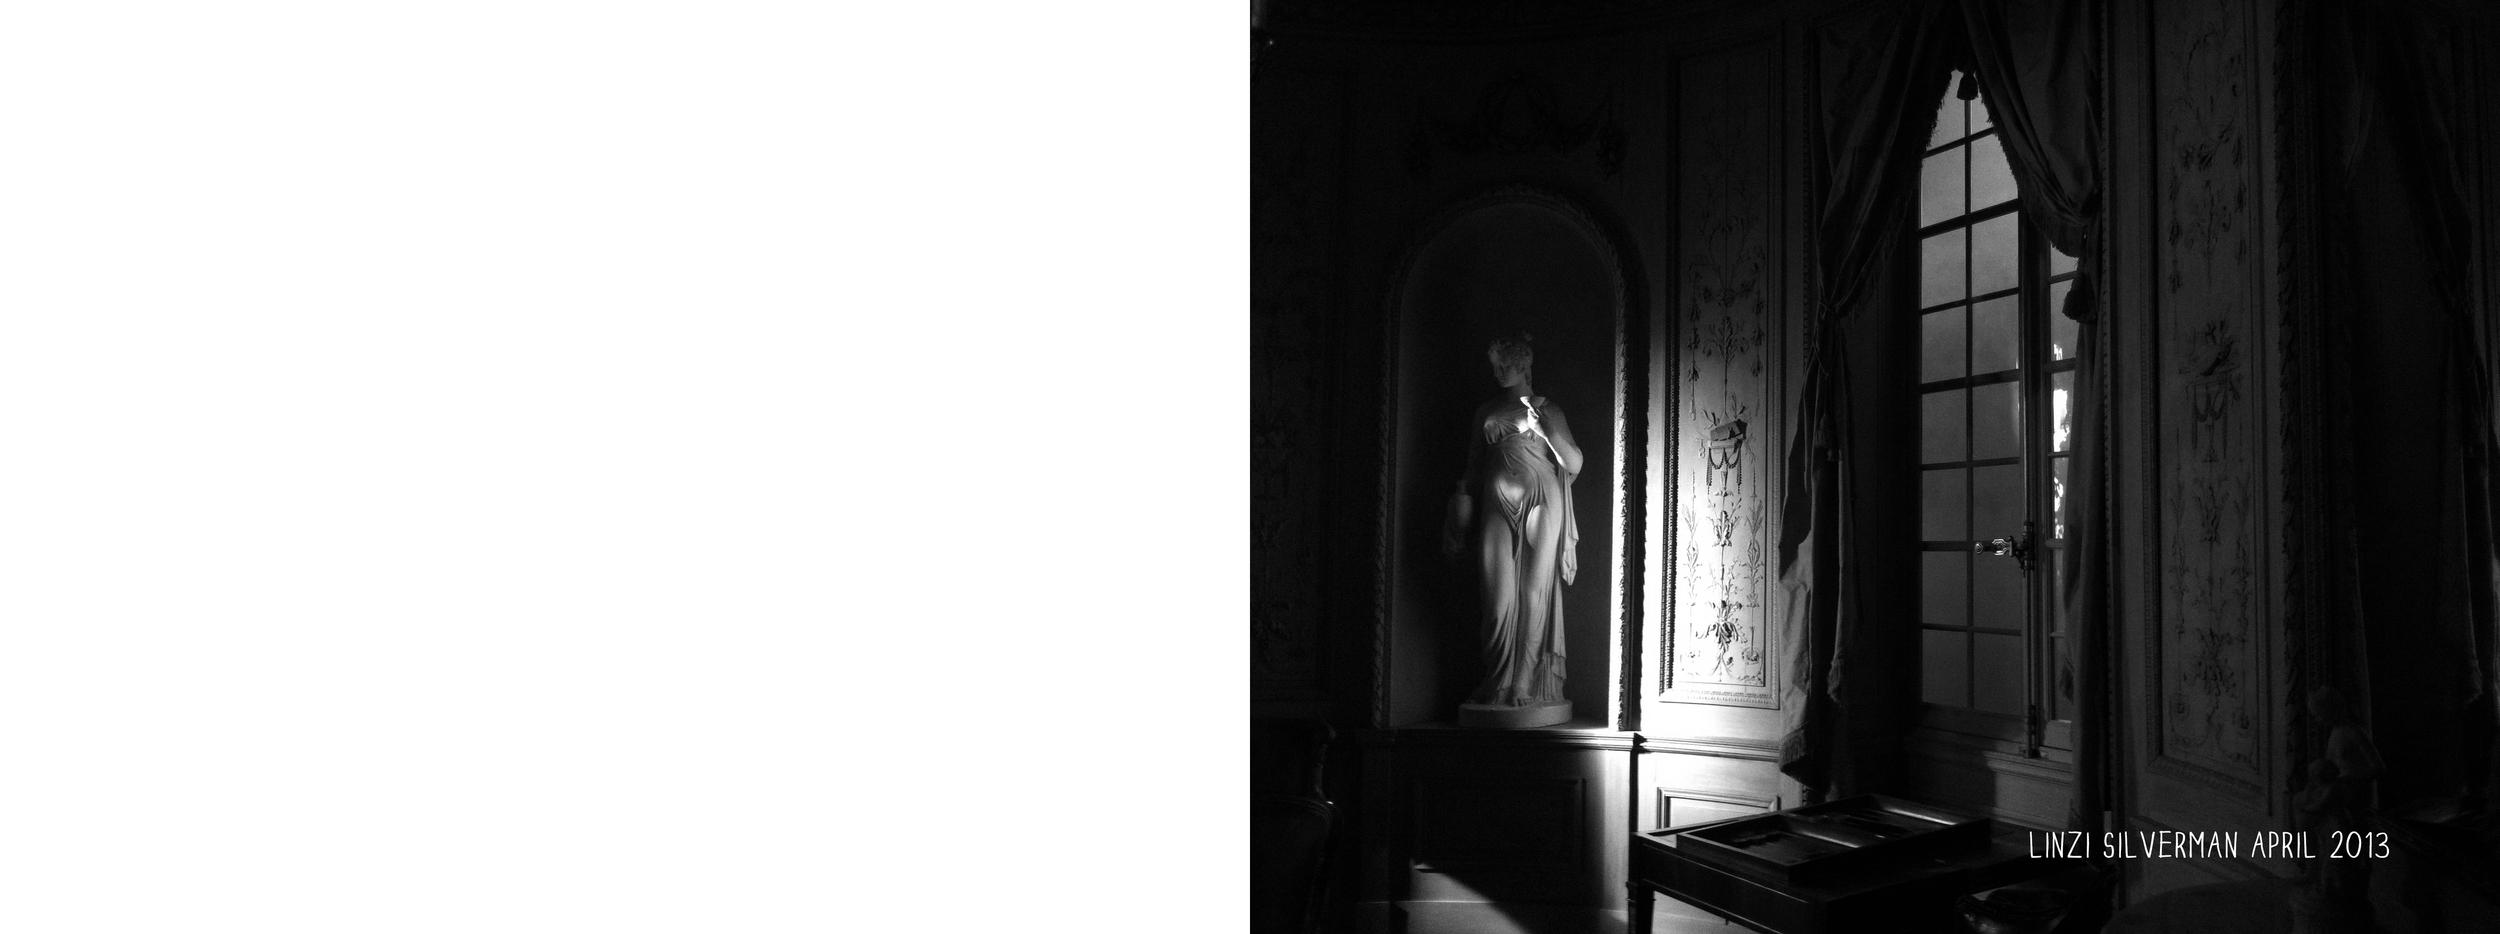 museum statuess.jpg